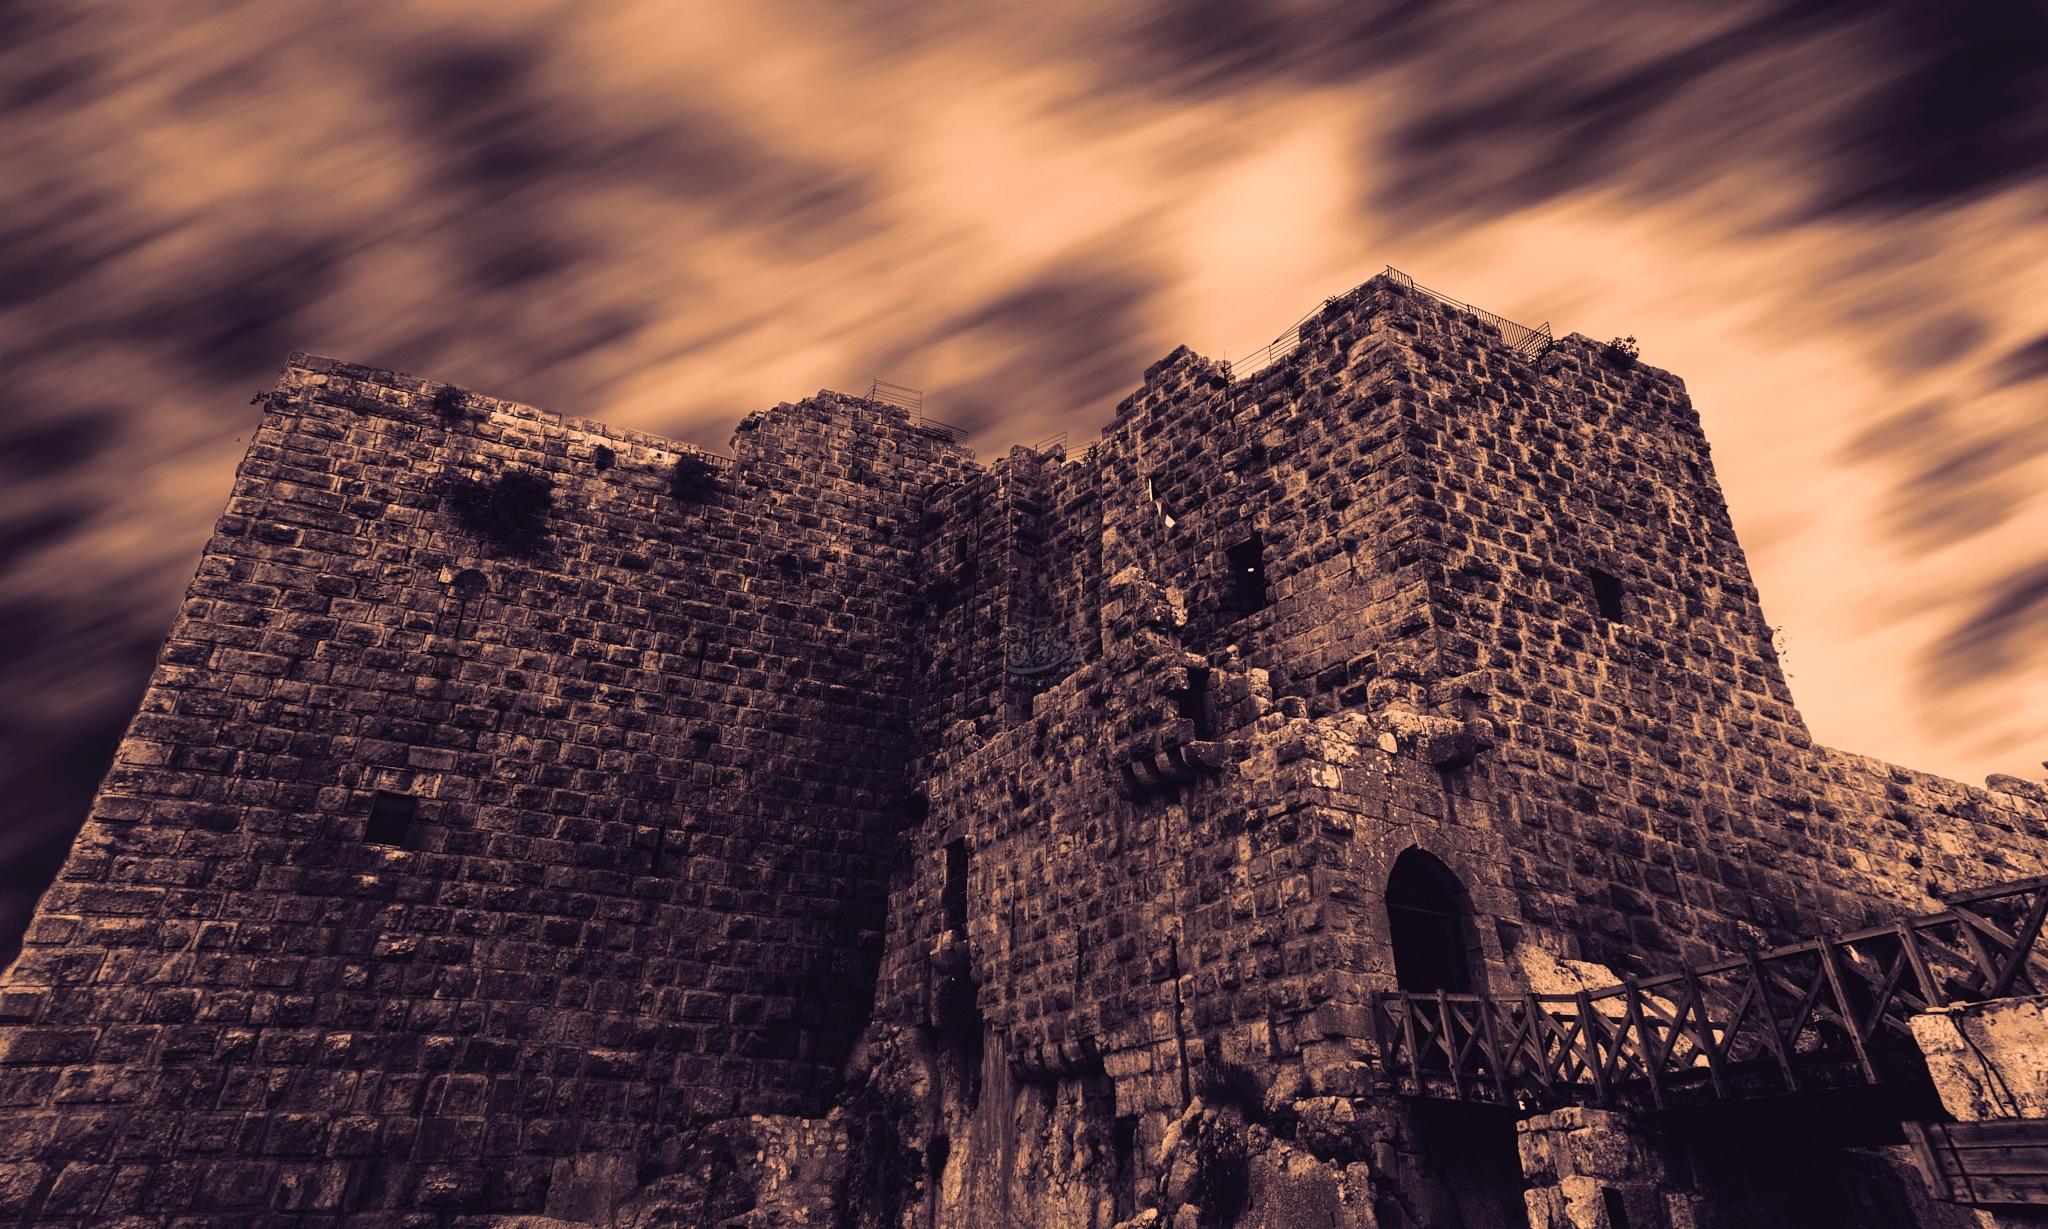 ajloon castle  by hothifaomari09